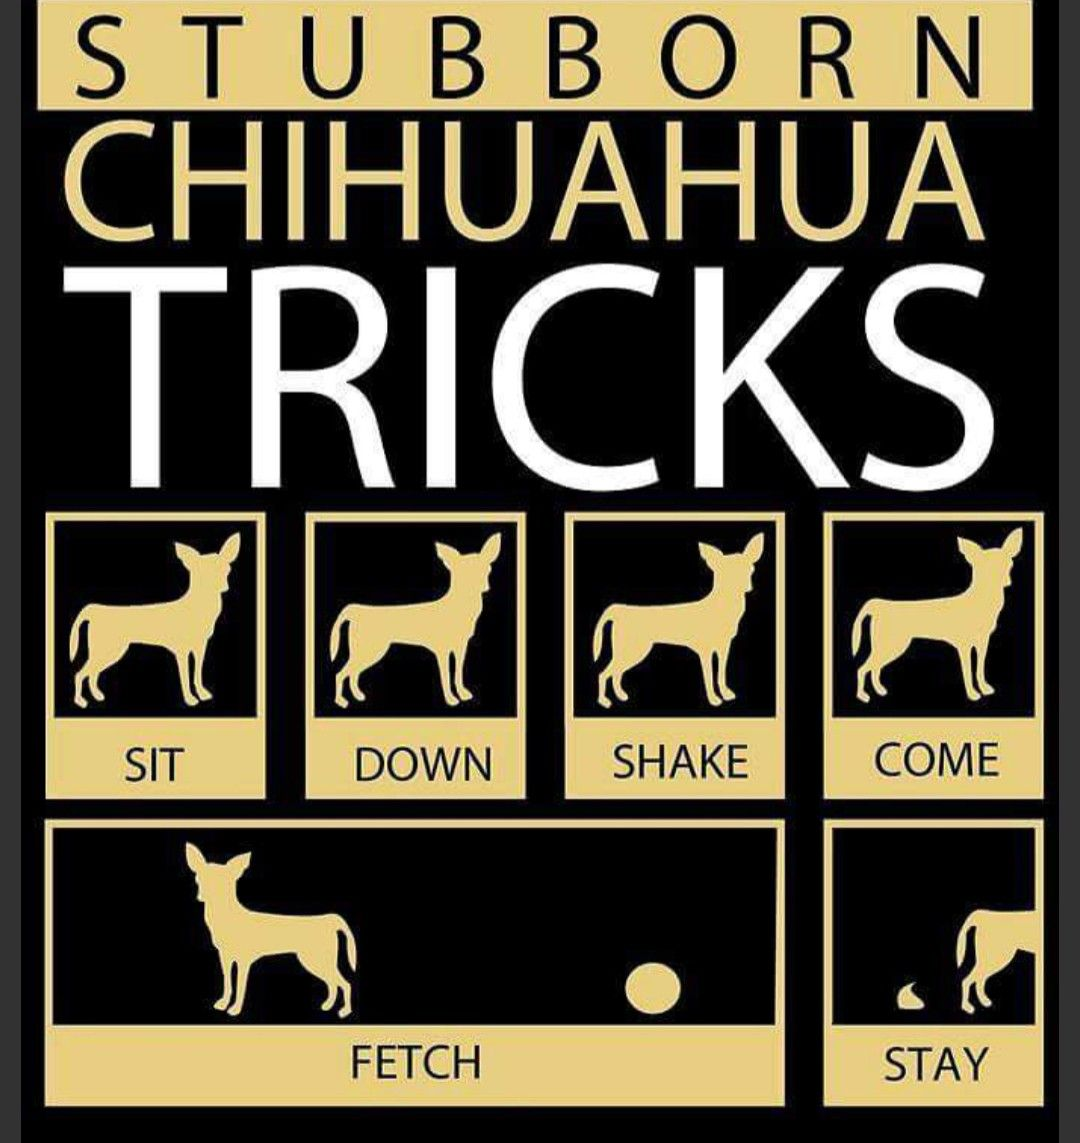 Pin by Sherry Garrett on chihuahua | Chihuahua funny ...